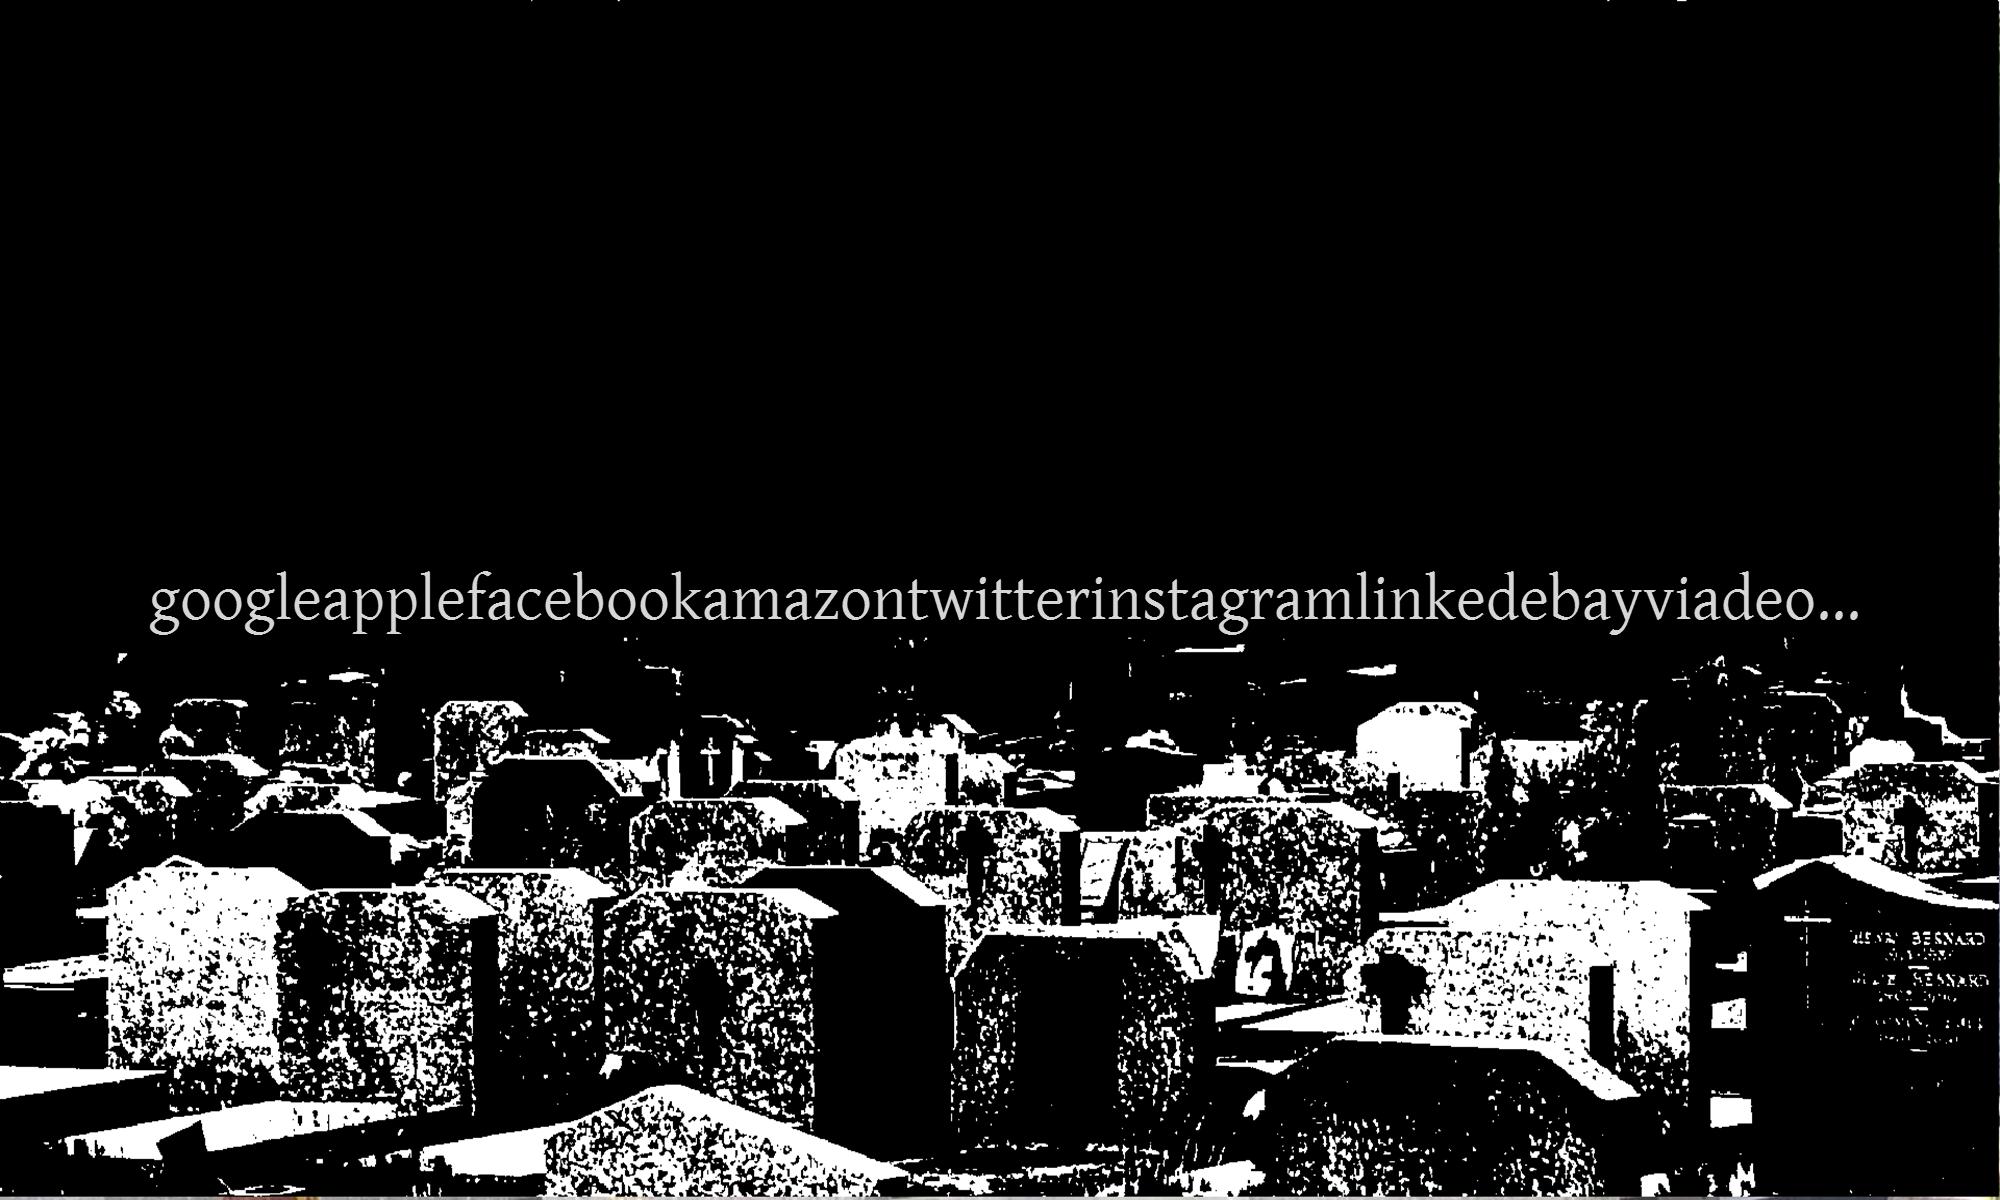 Questions - vos comptes vont danser sur vos tombes, sauf intervention...